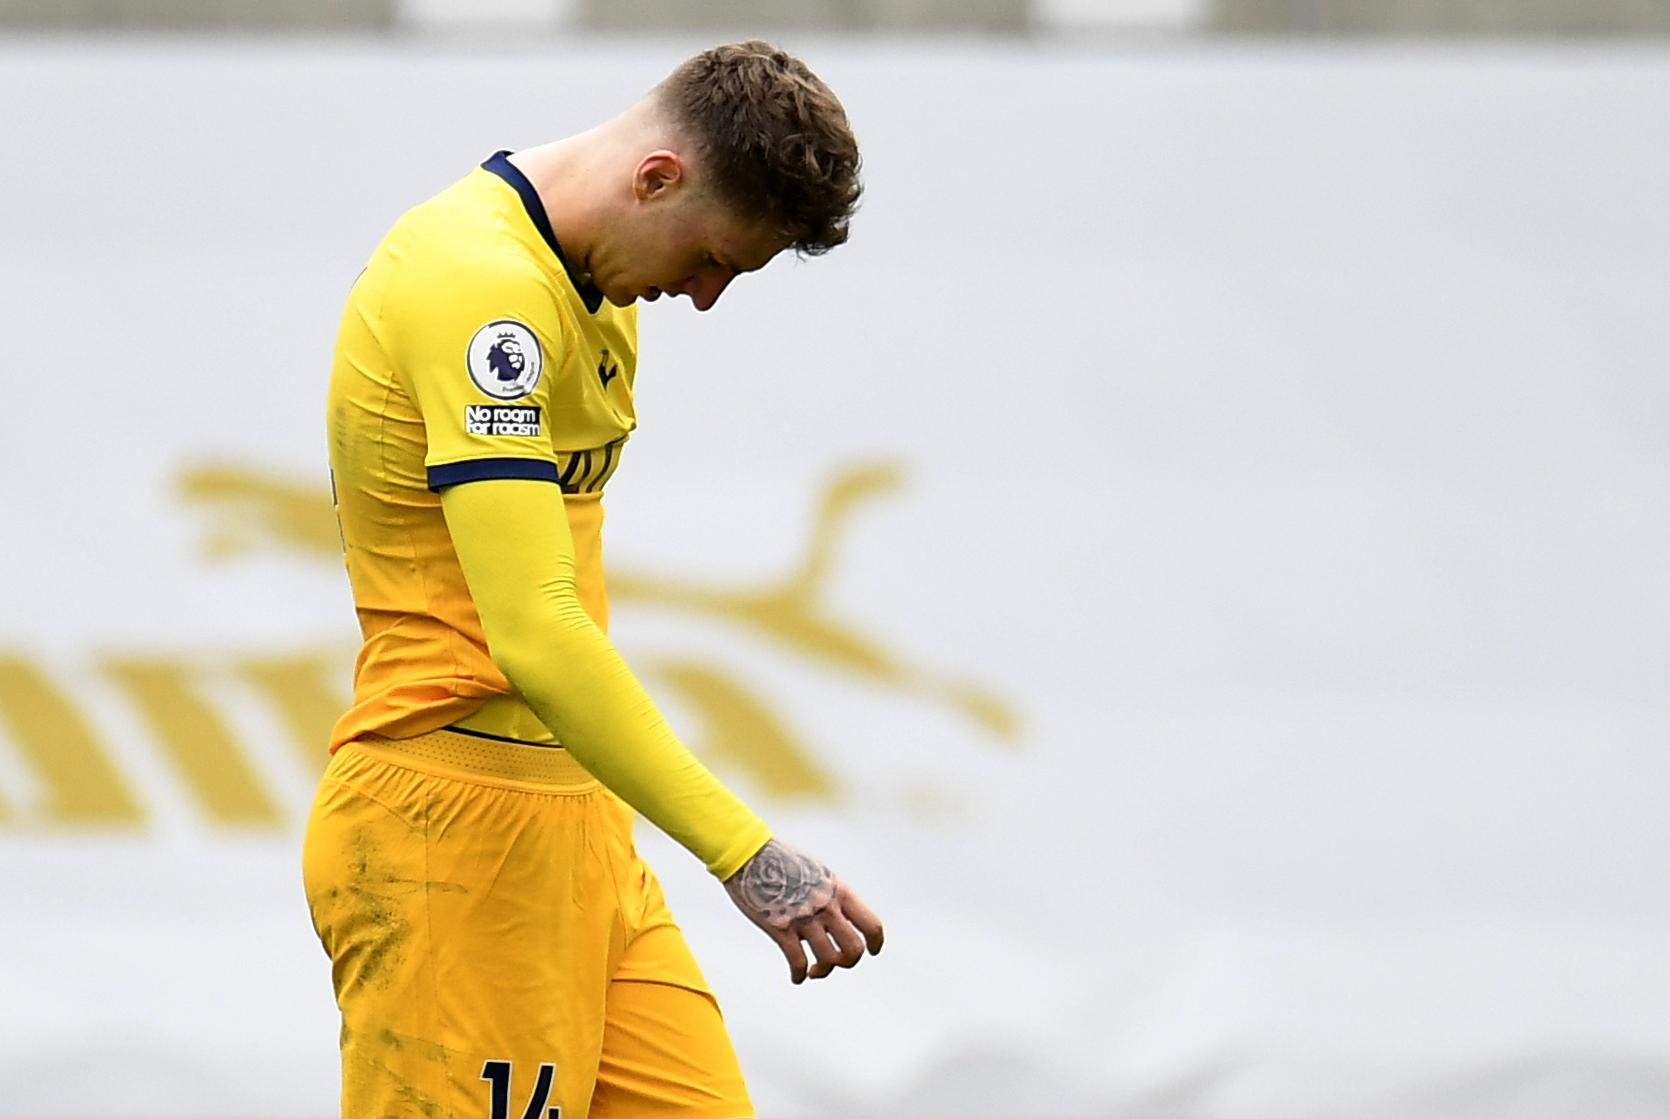 Premier League: Χαμένη ευκαιρία για Τότεναμ (video)